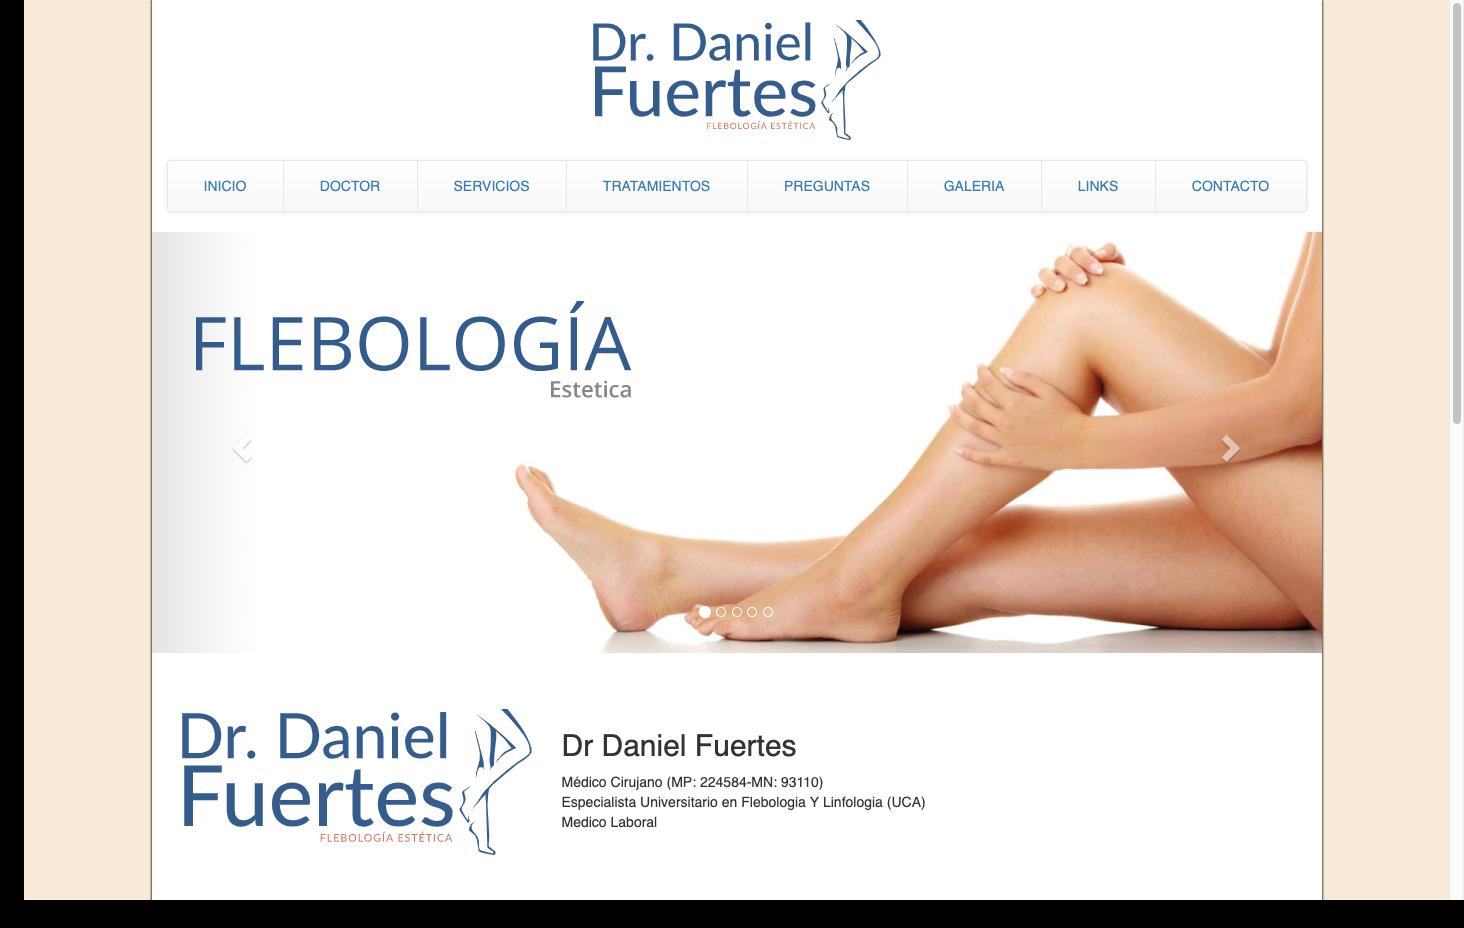 Dr Daniel Fuertes